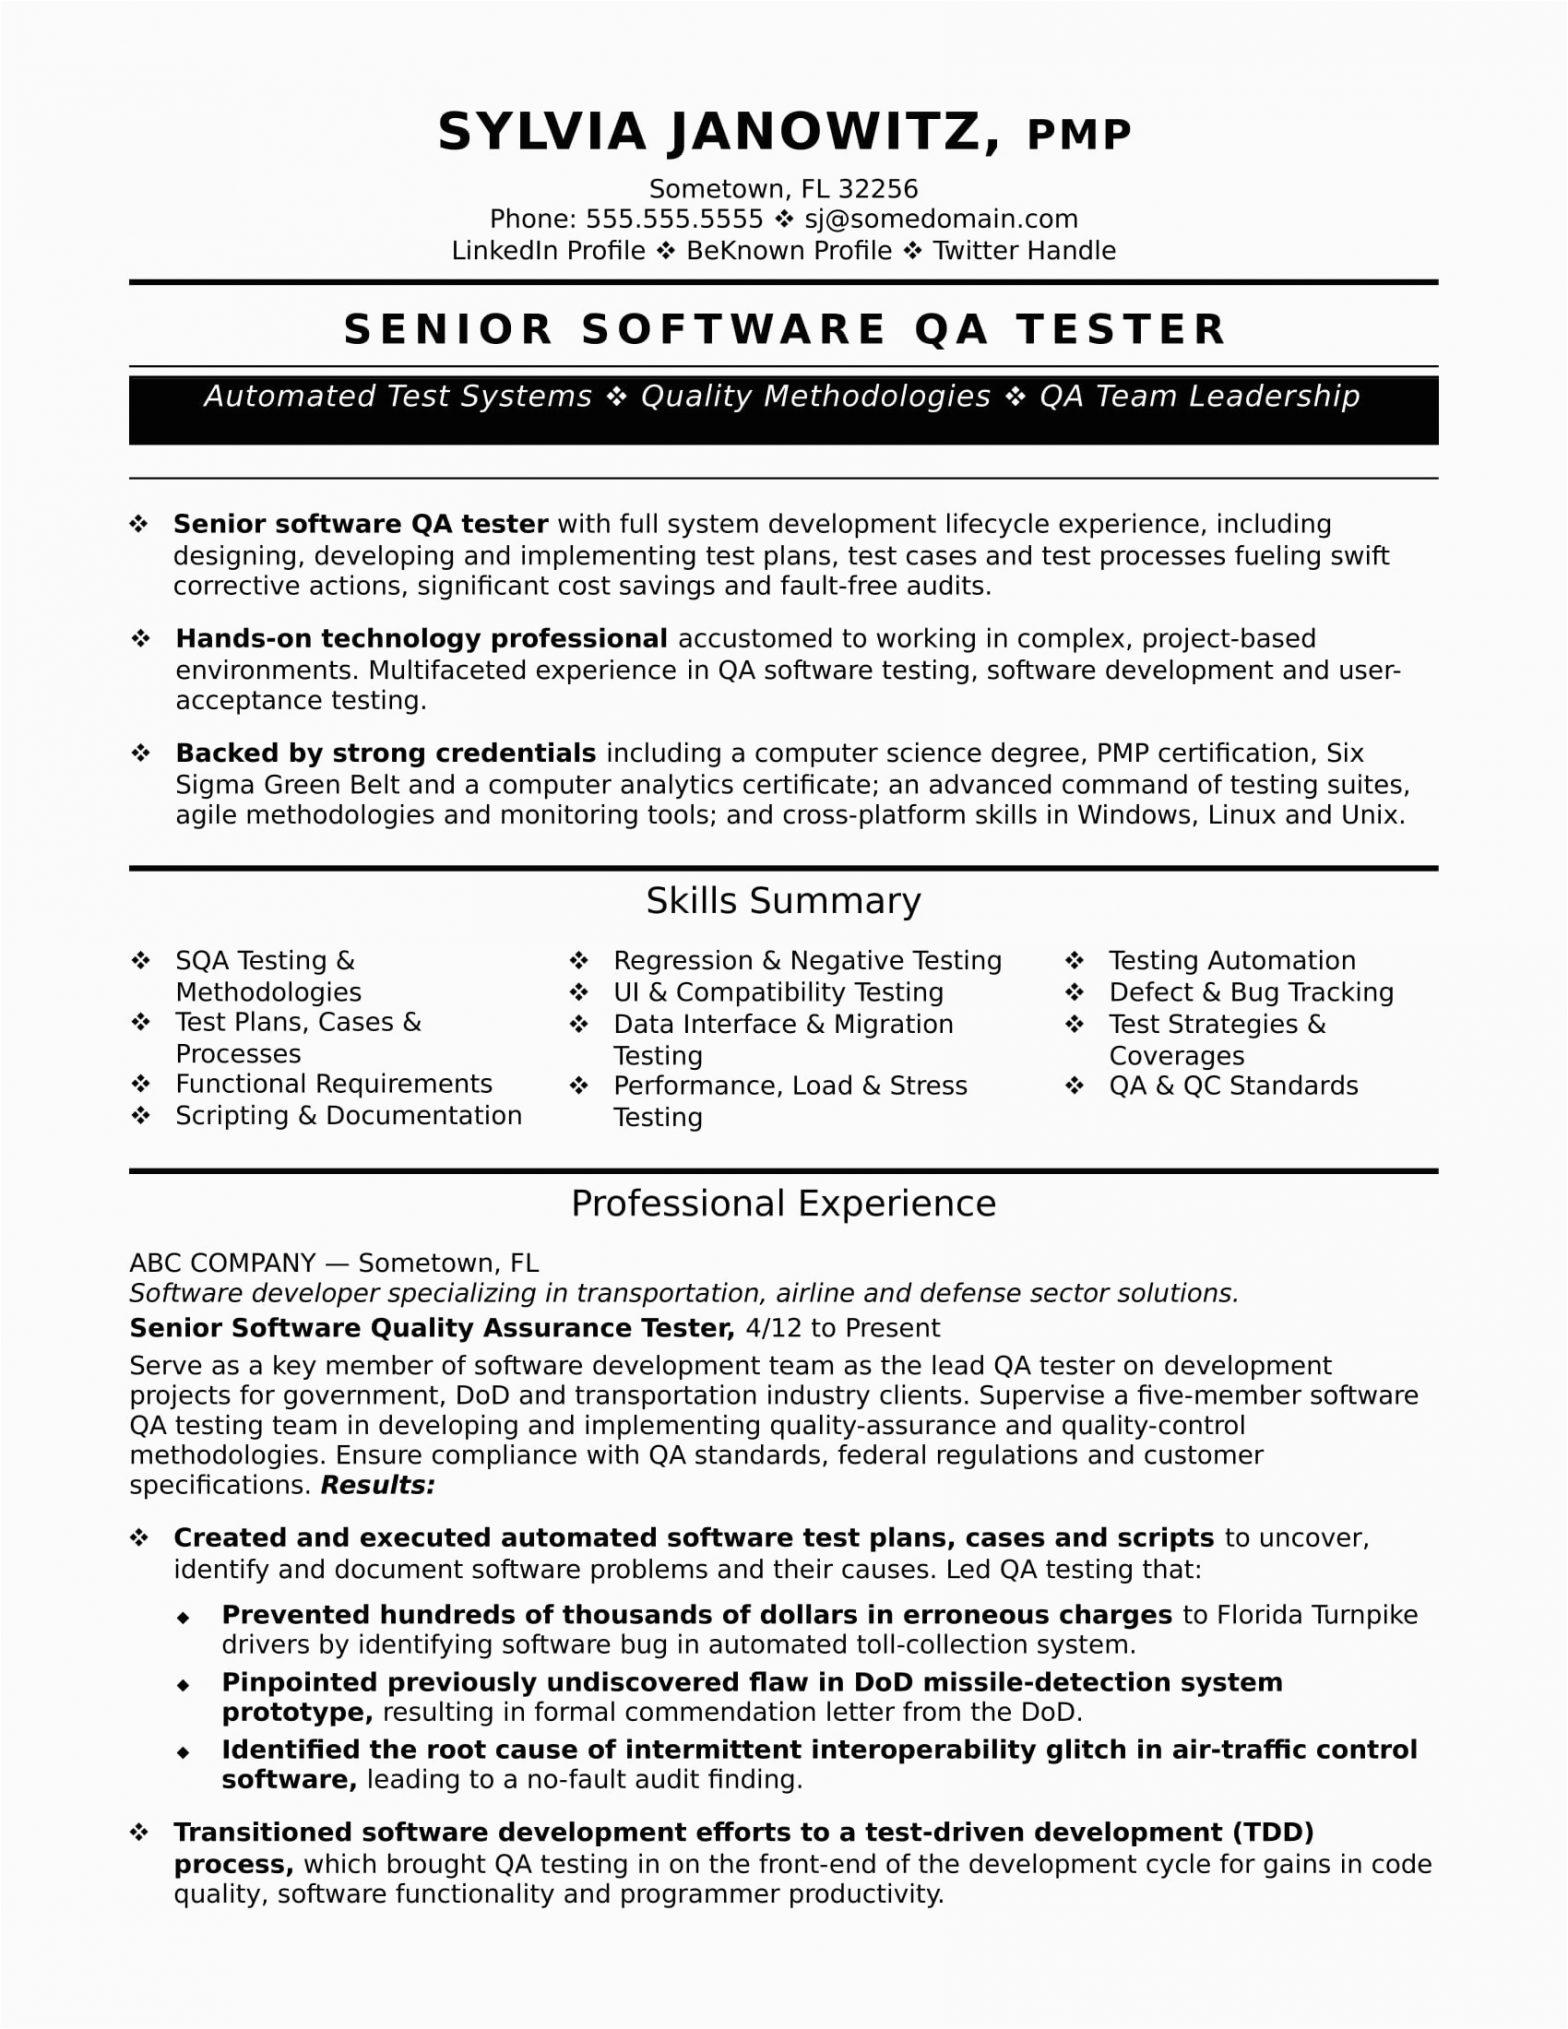 Sample Resume for Experienced Qa Tester Experienced Qa software Tester Resume Sample